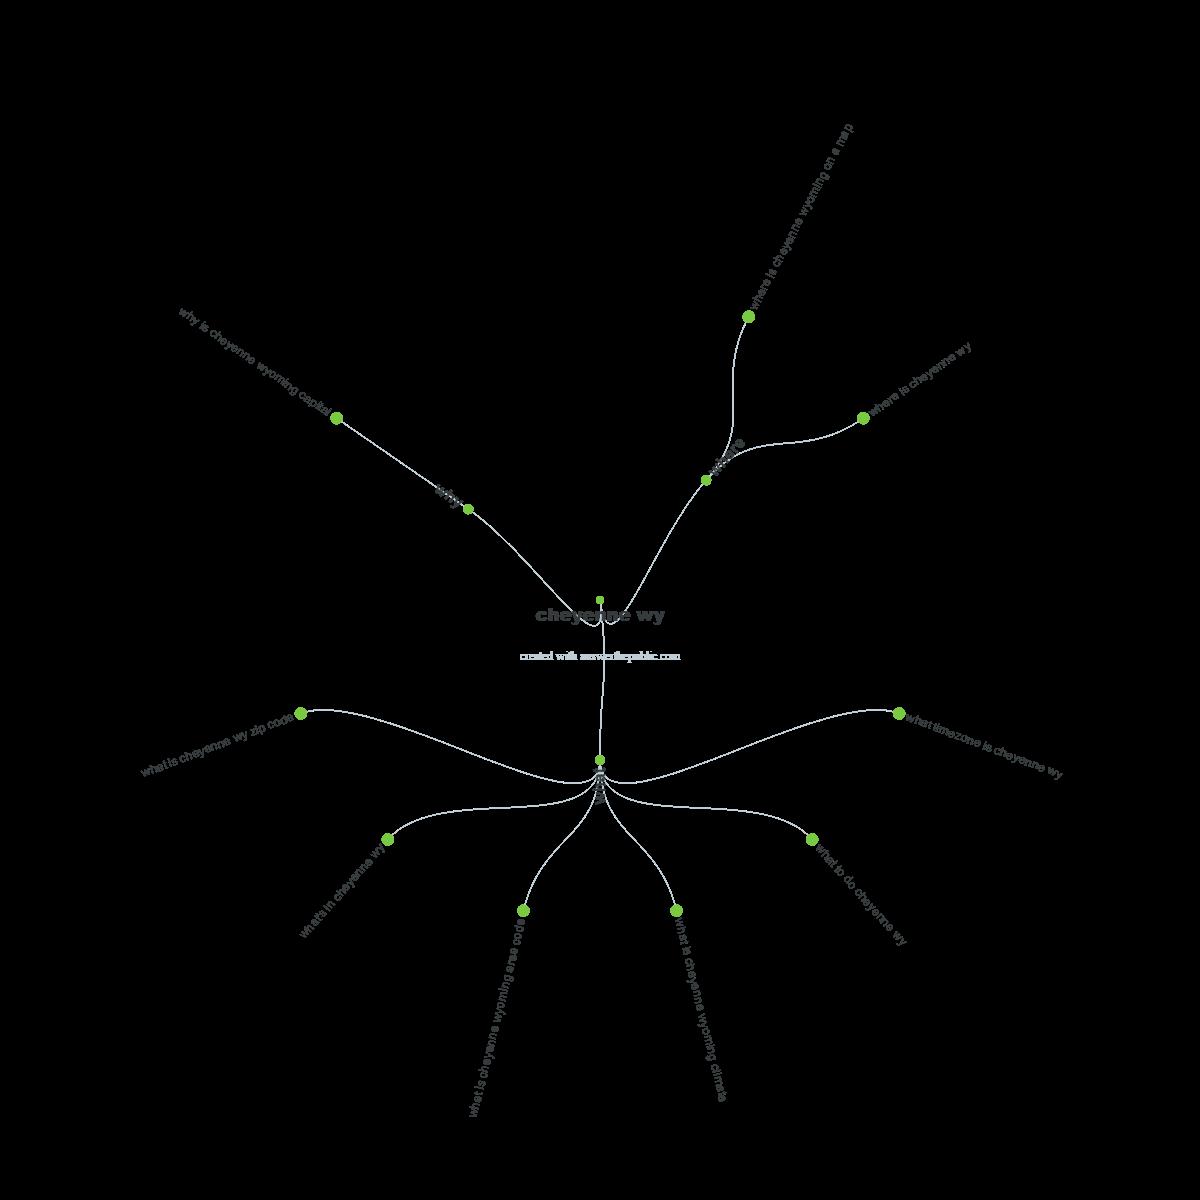 AnswerThePublic's Interface